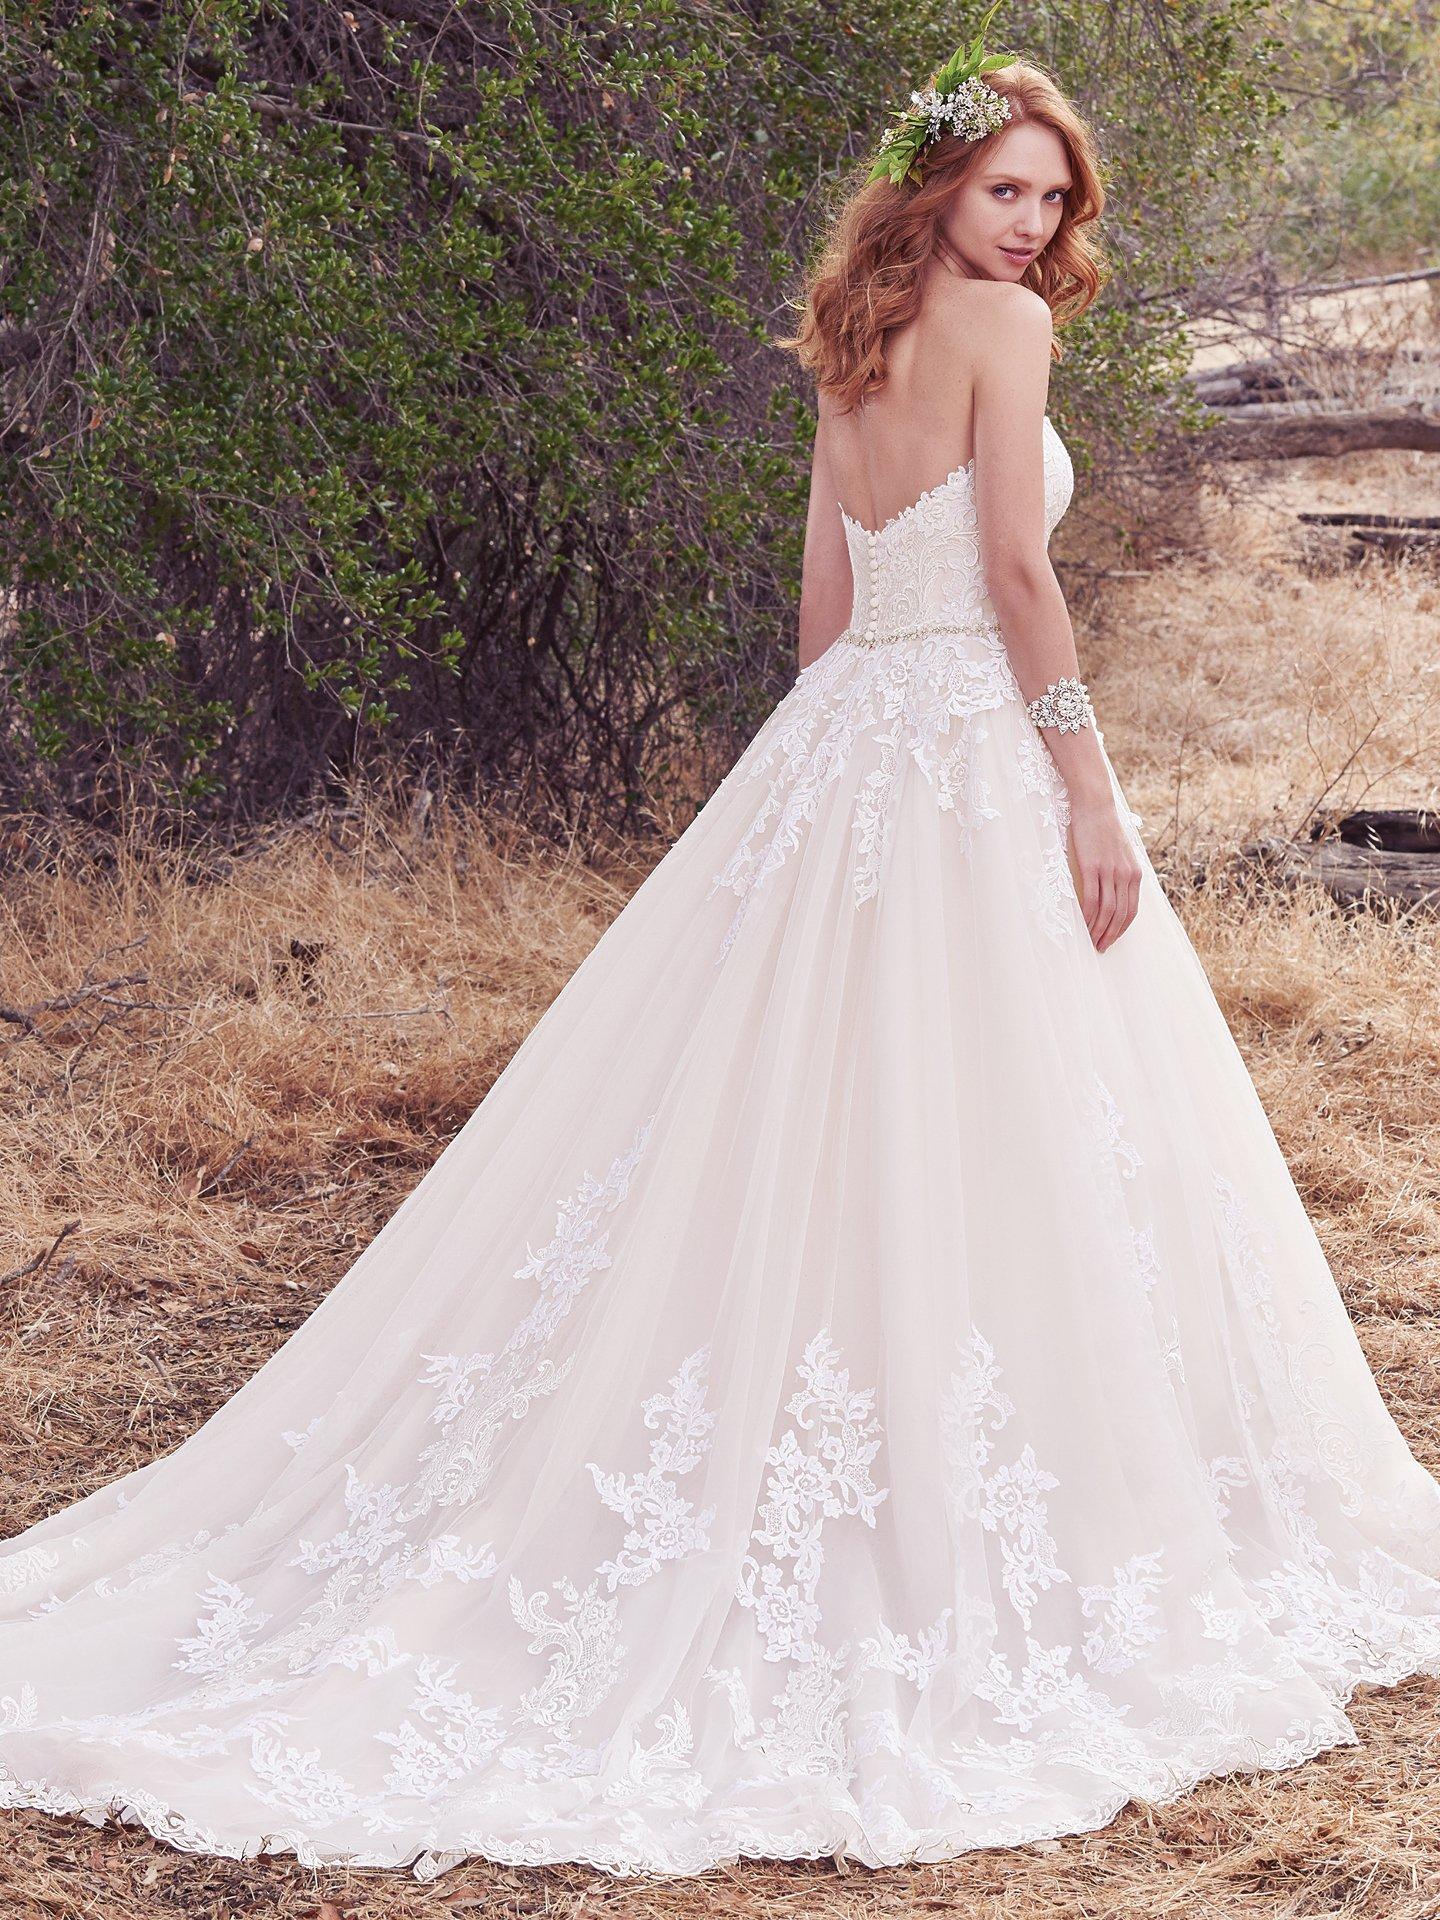 Maggie-Sottero-Wedding-Dress-Irma-7MS933-Back.jpg